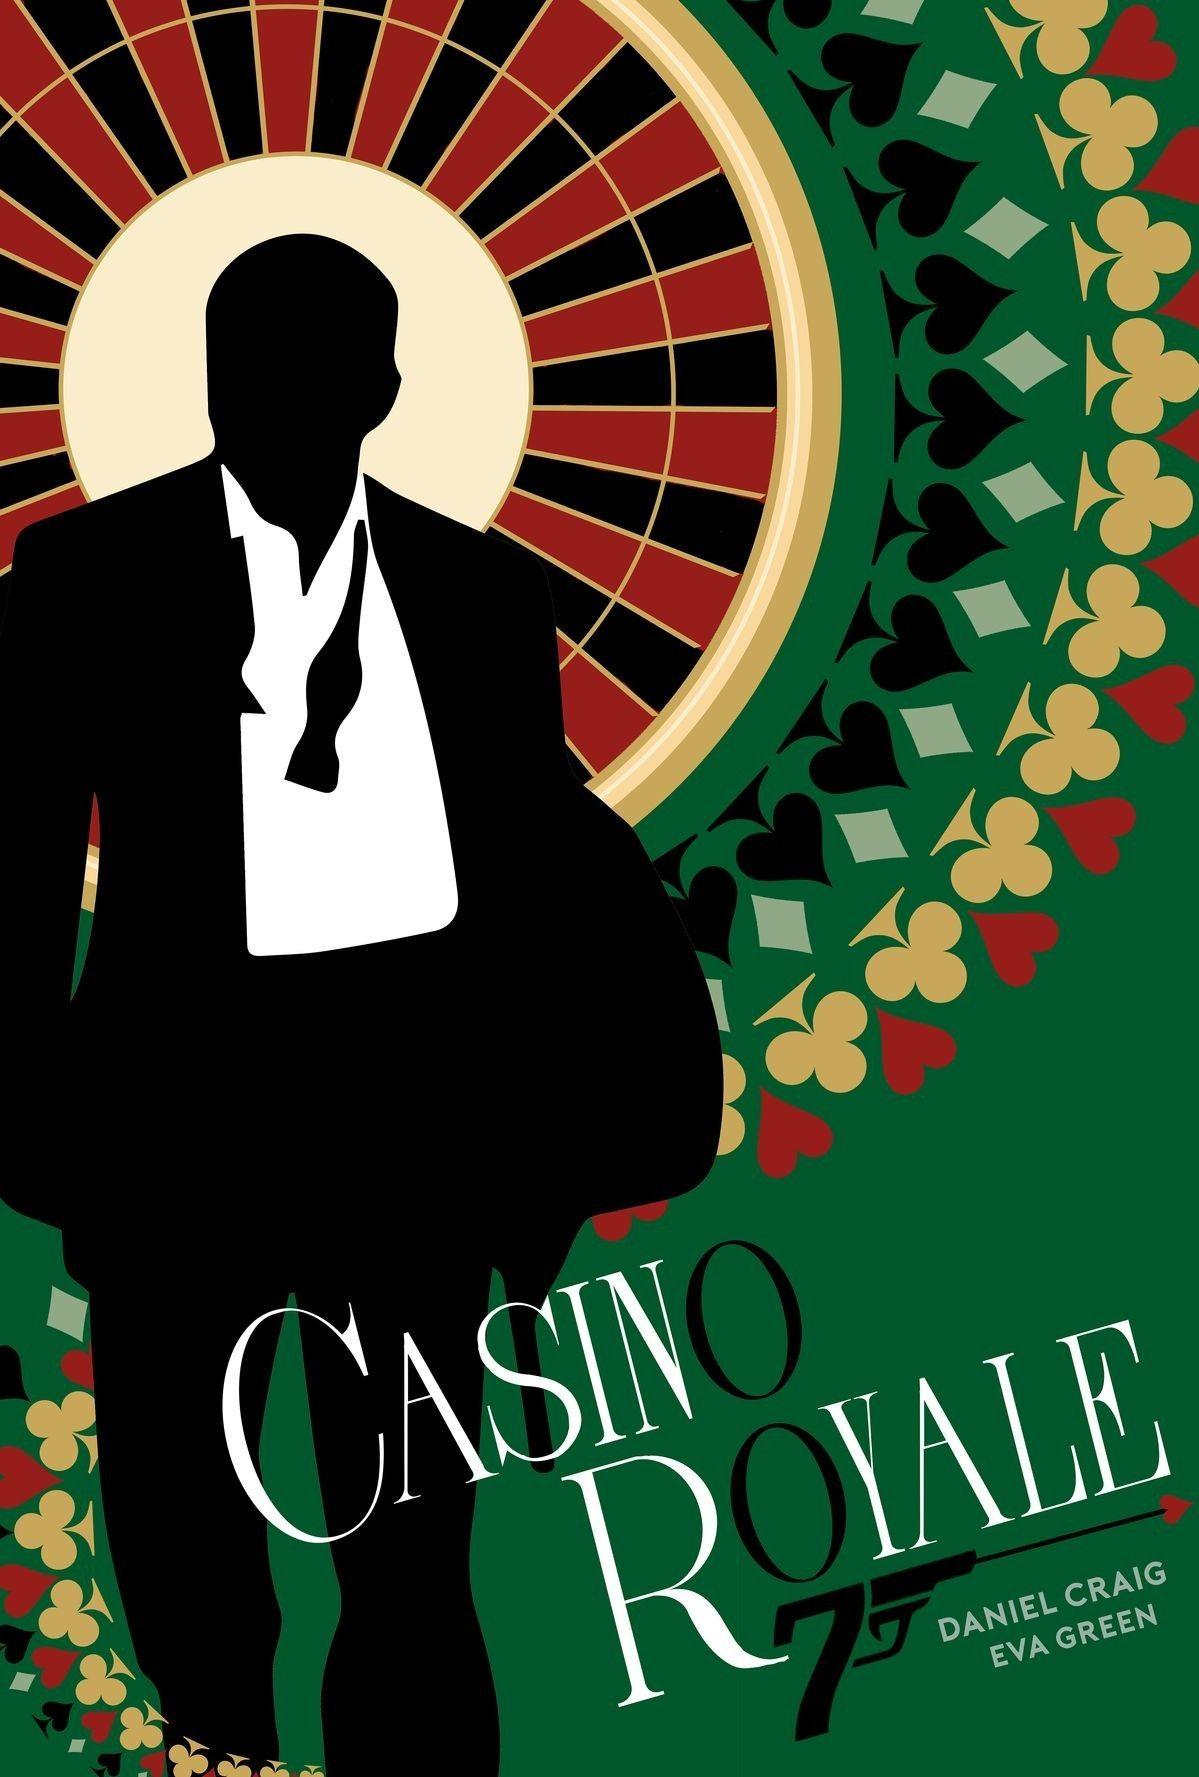 FRAMED James Bond Movie Poster Film Prints Casino Royale Daniel Craig